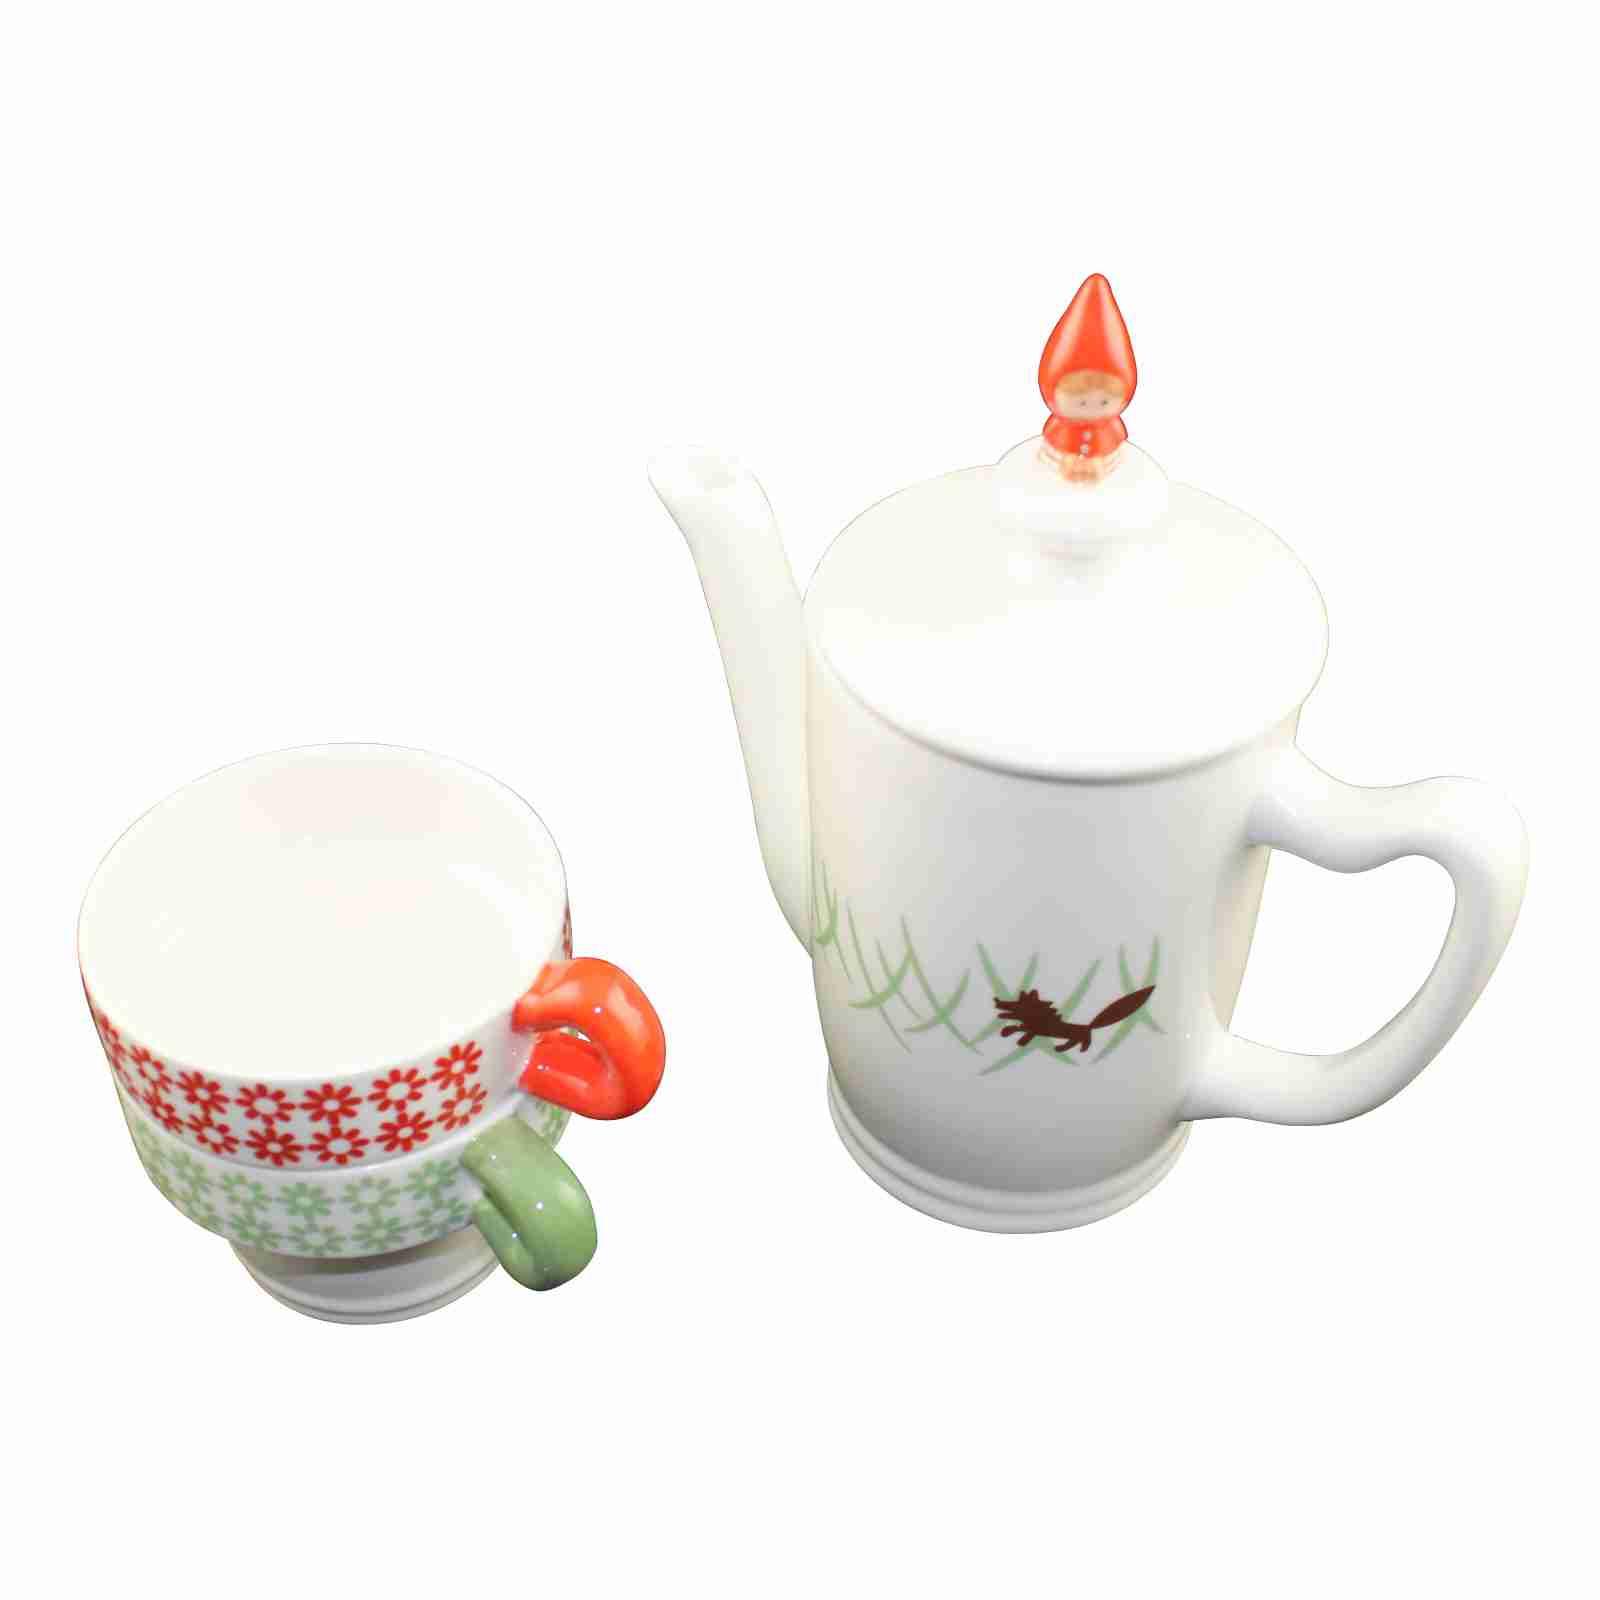 Tea for Two Red Riding Hood by Shinzi Katoh